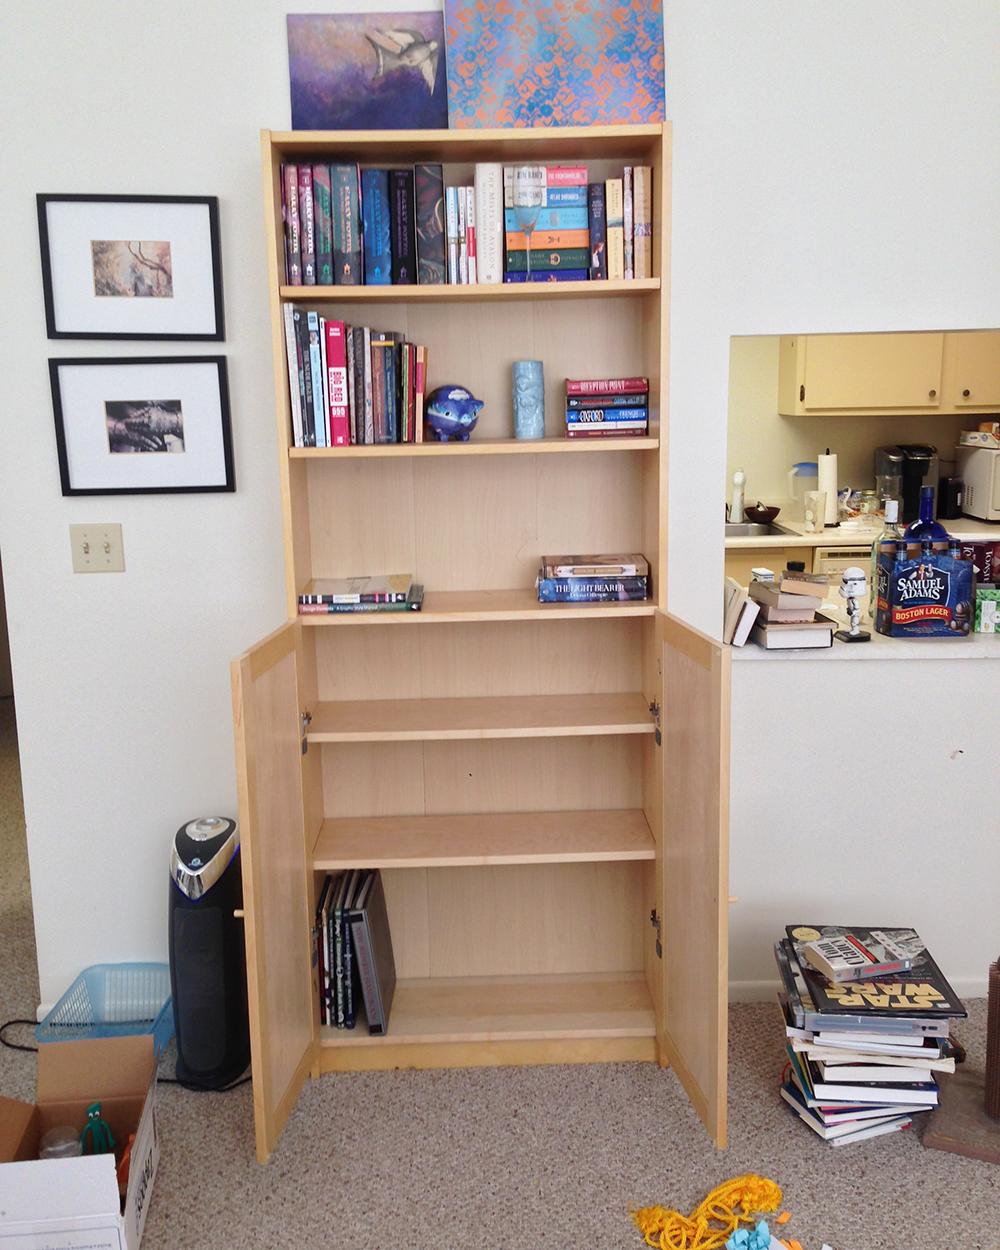 The first great book purge bookshelf